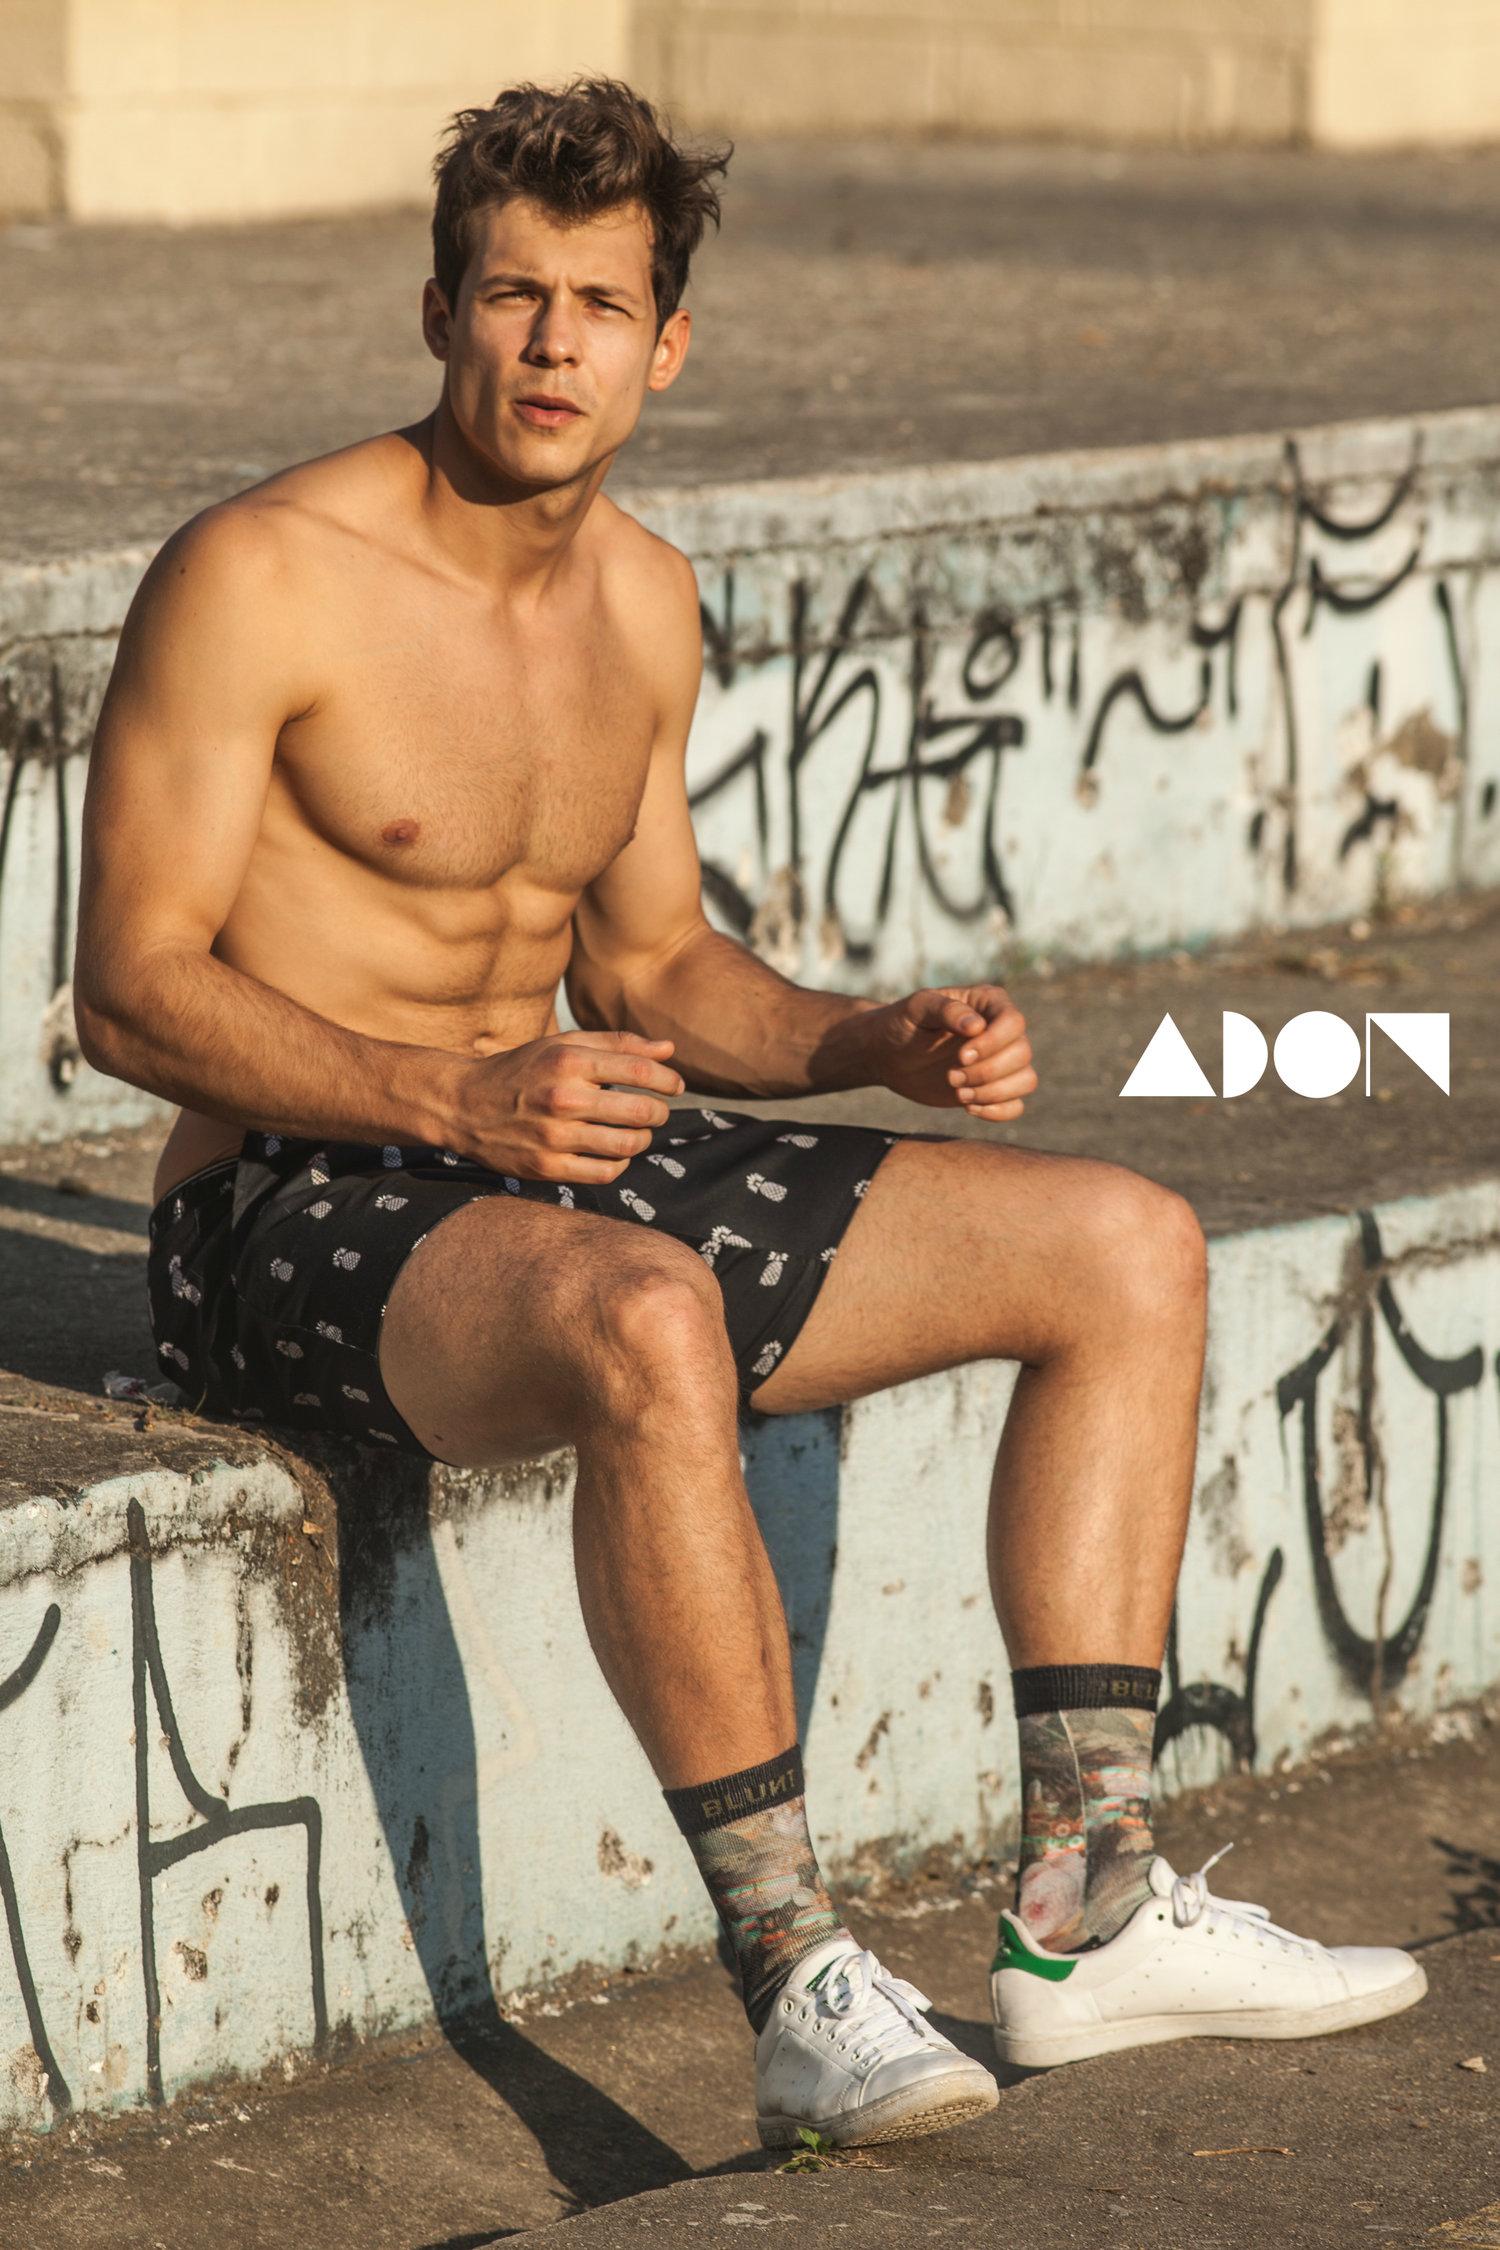 Adon Exclusive: Model Fernando Pessiquelli By Marcelo Auge